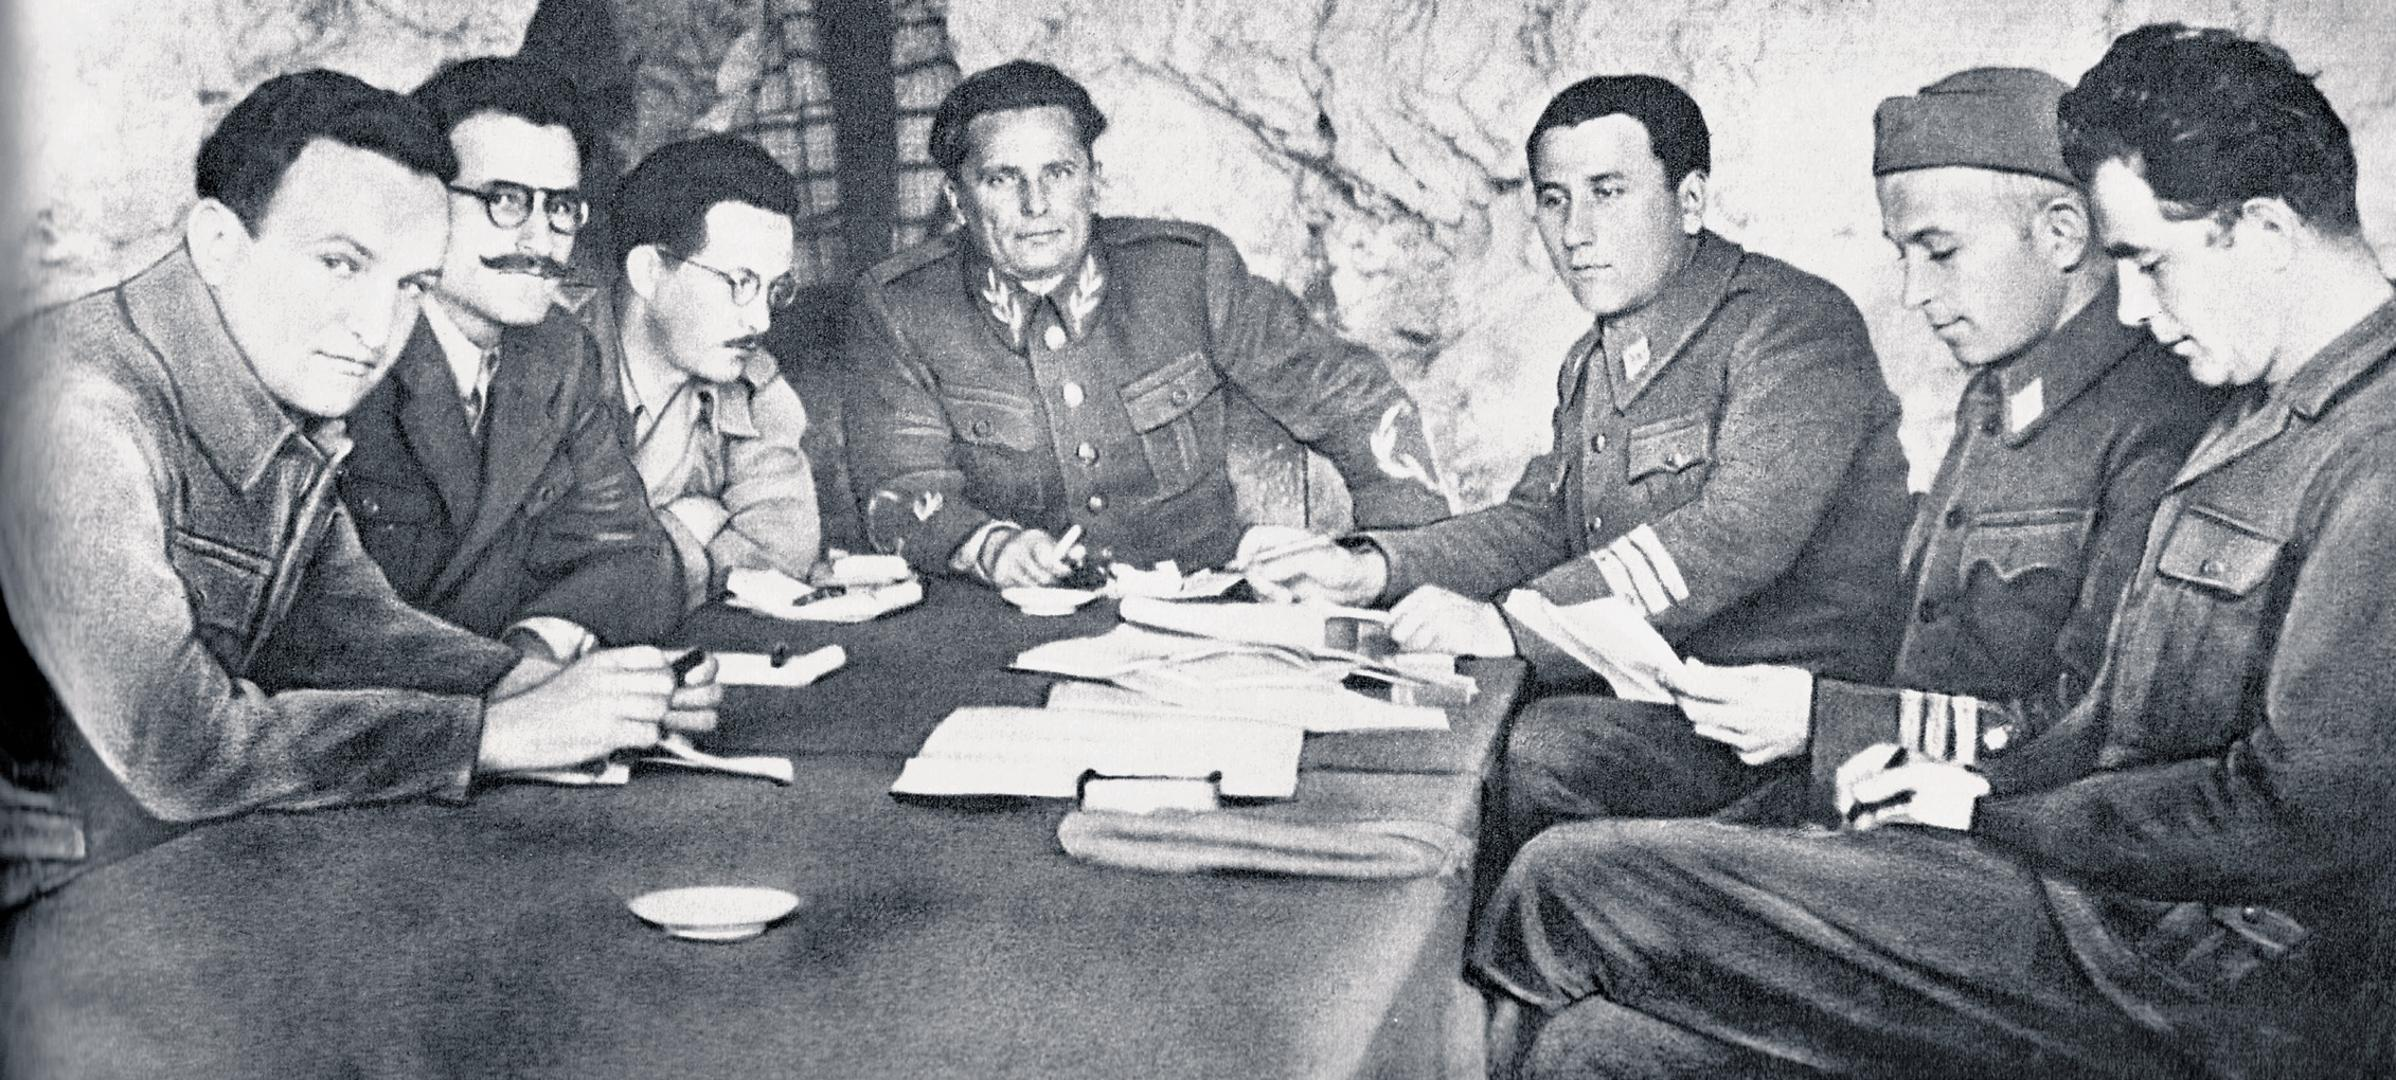 Bakarić, Ivan Milutinović, Edvard Kardelj, Tito, Aleksandar Ranković, Svetozar Vukmanović - Tempo i Milovan Đilas u pećini na Visu 1944.